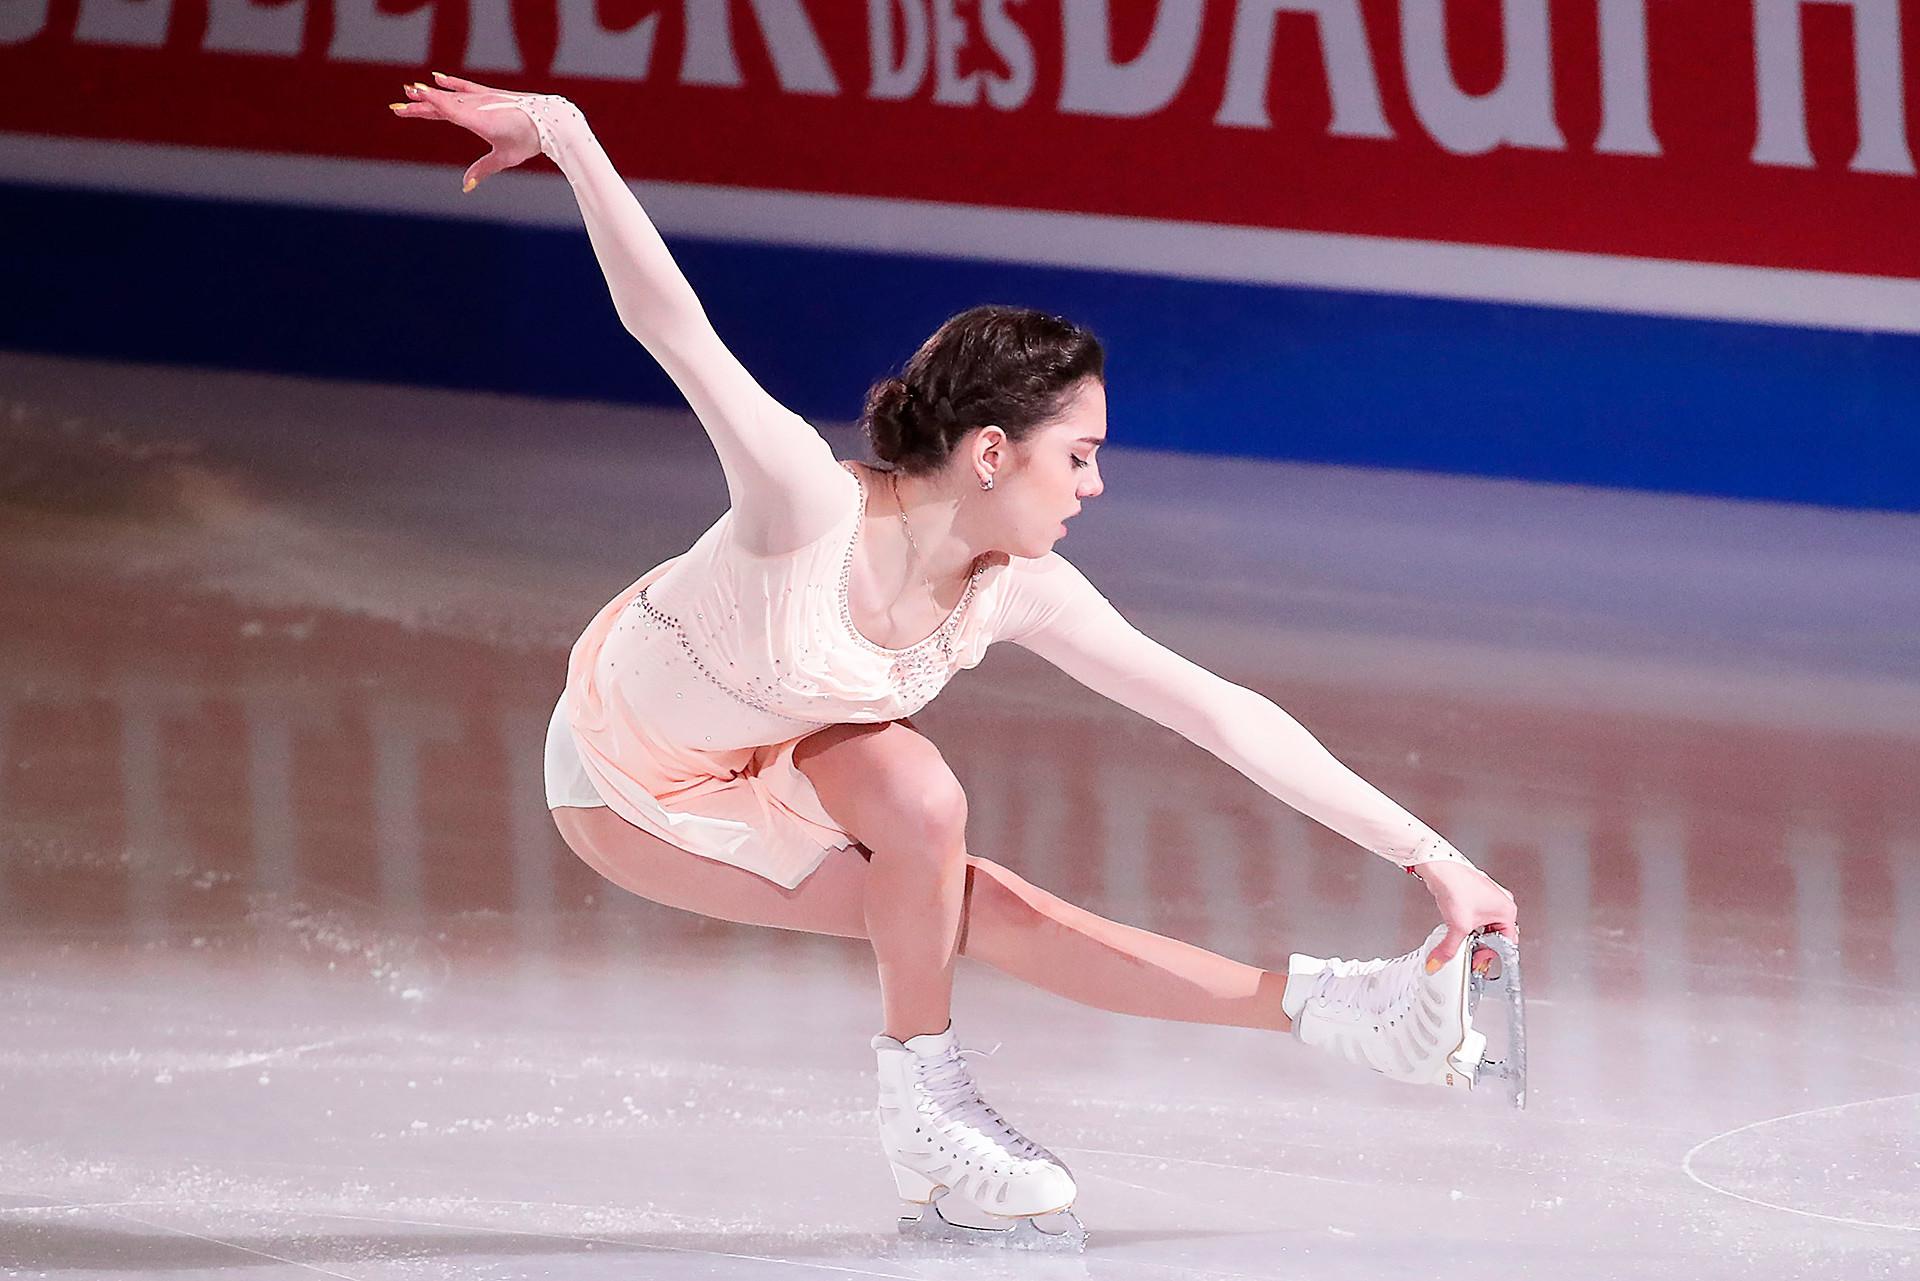 Evgenia Medvedeva aux Championnats du monde d'Helsinki.